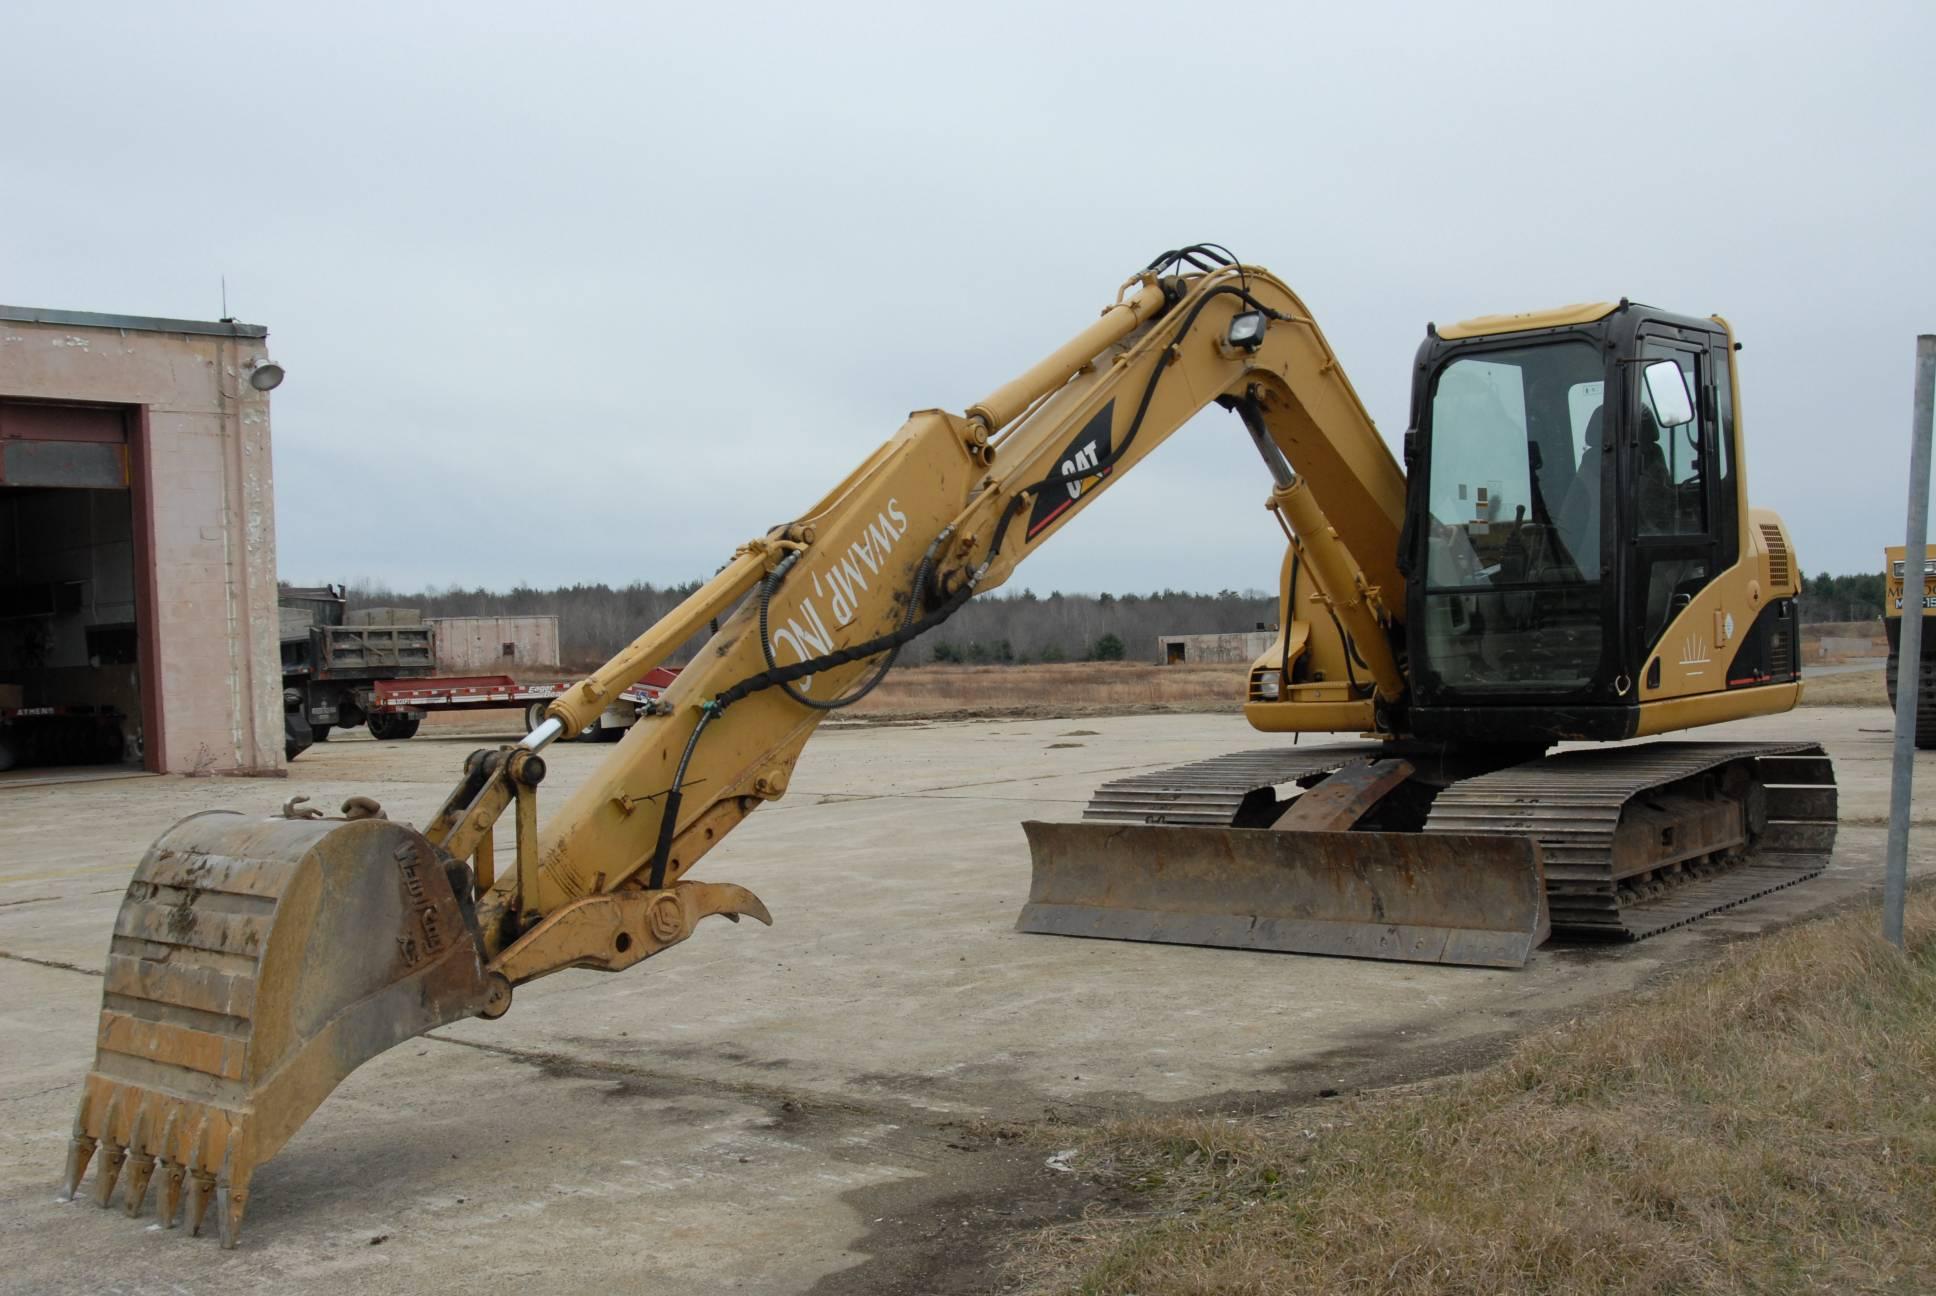 Low Ground Pressure Excavator